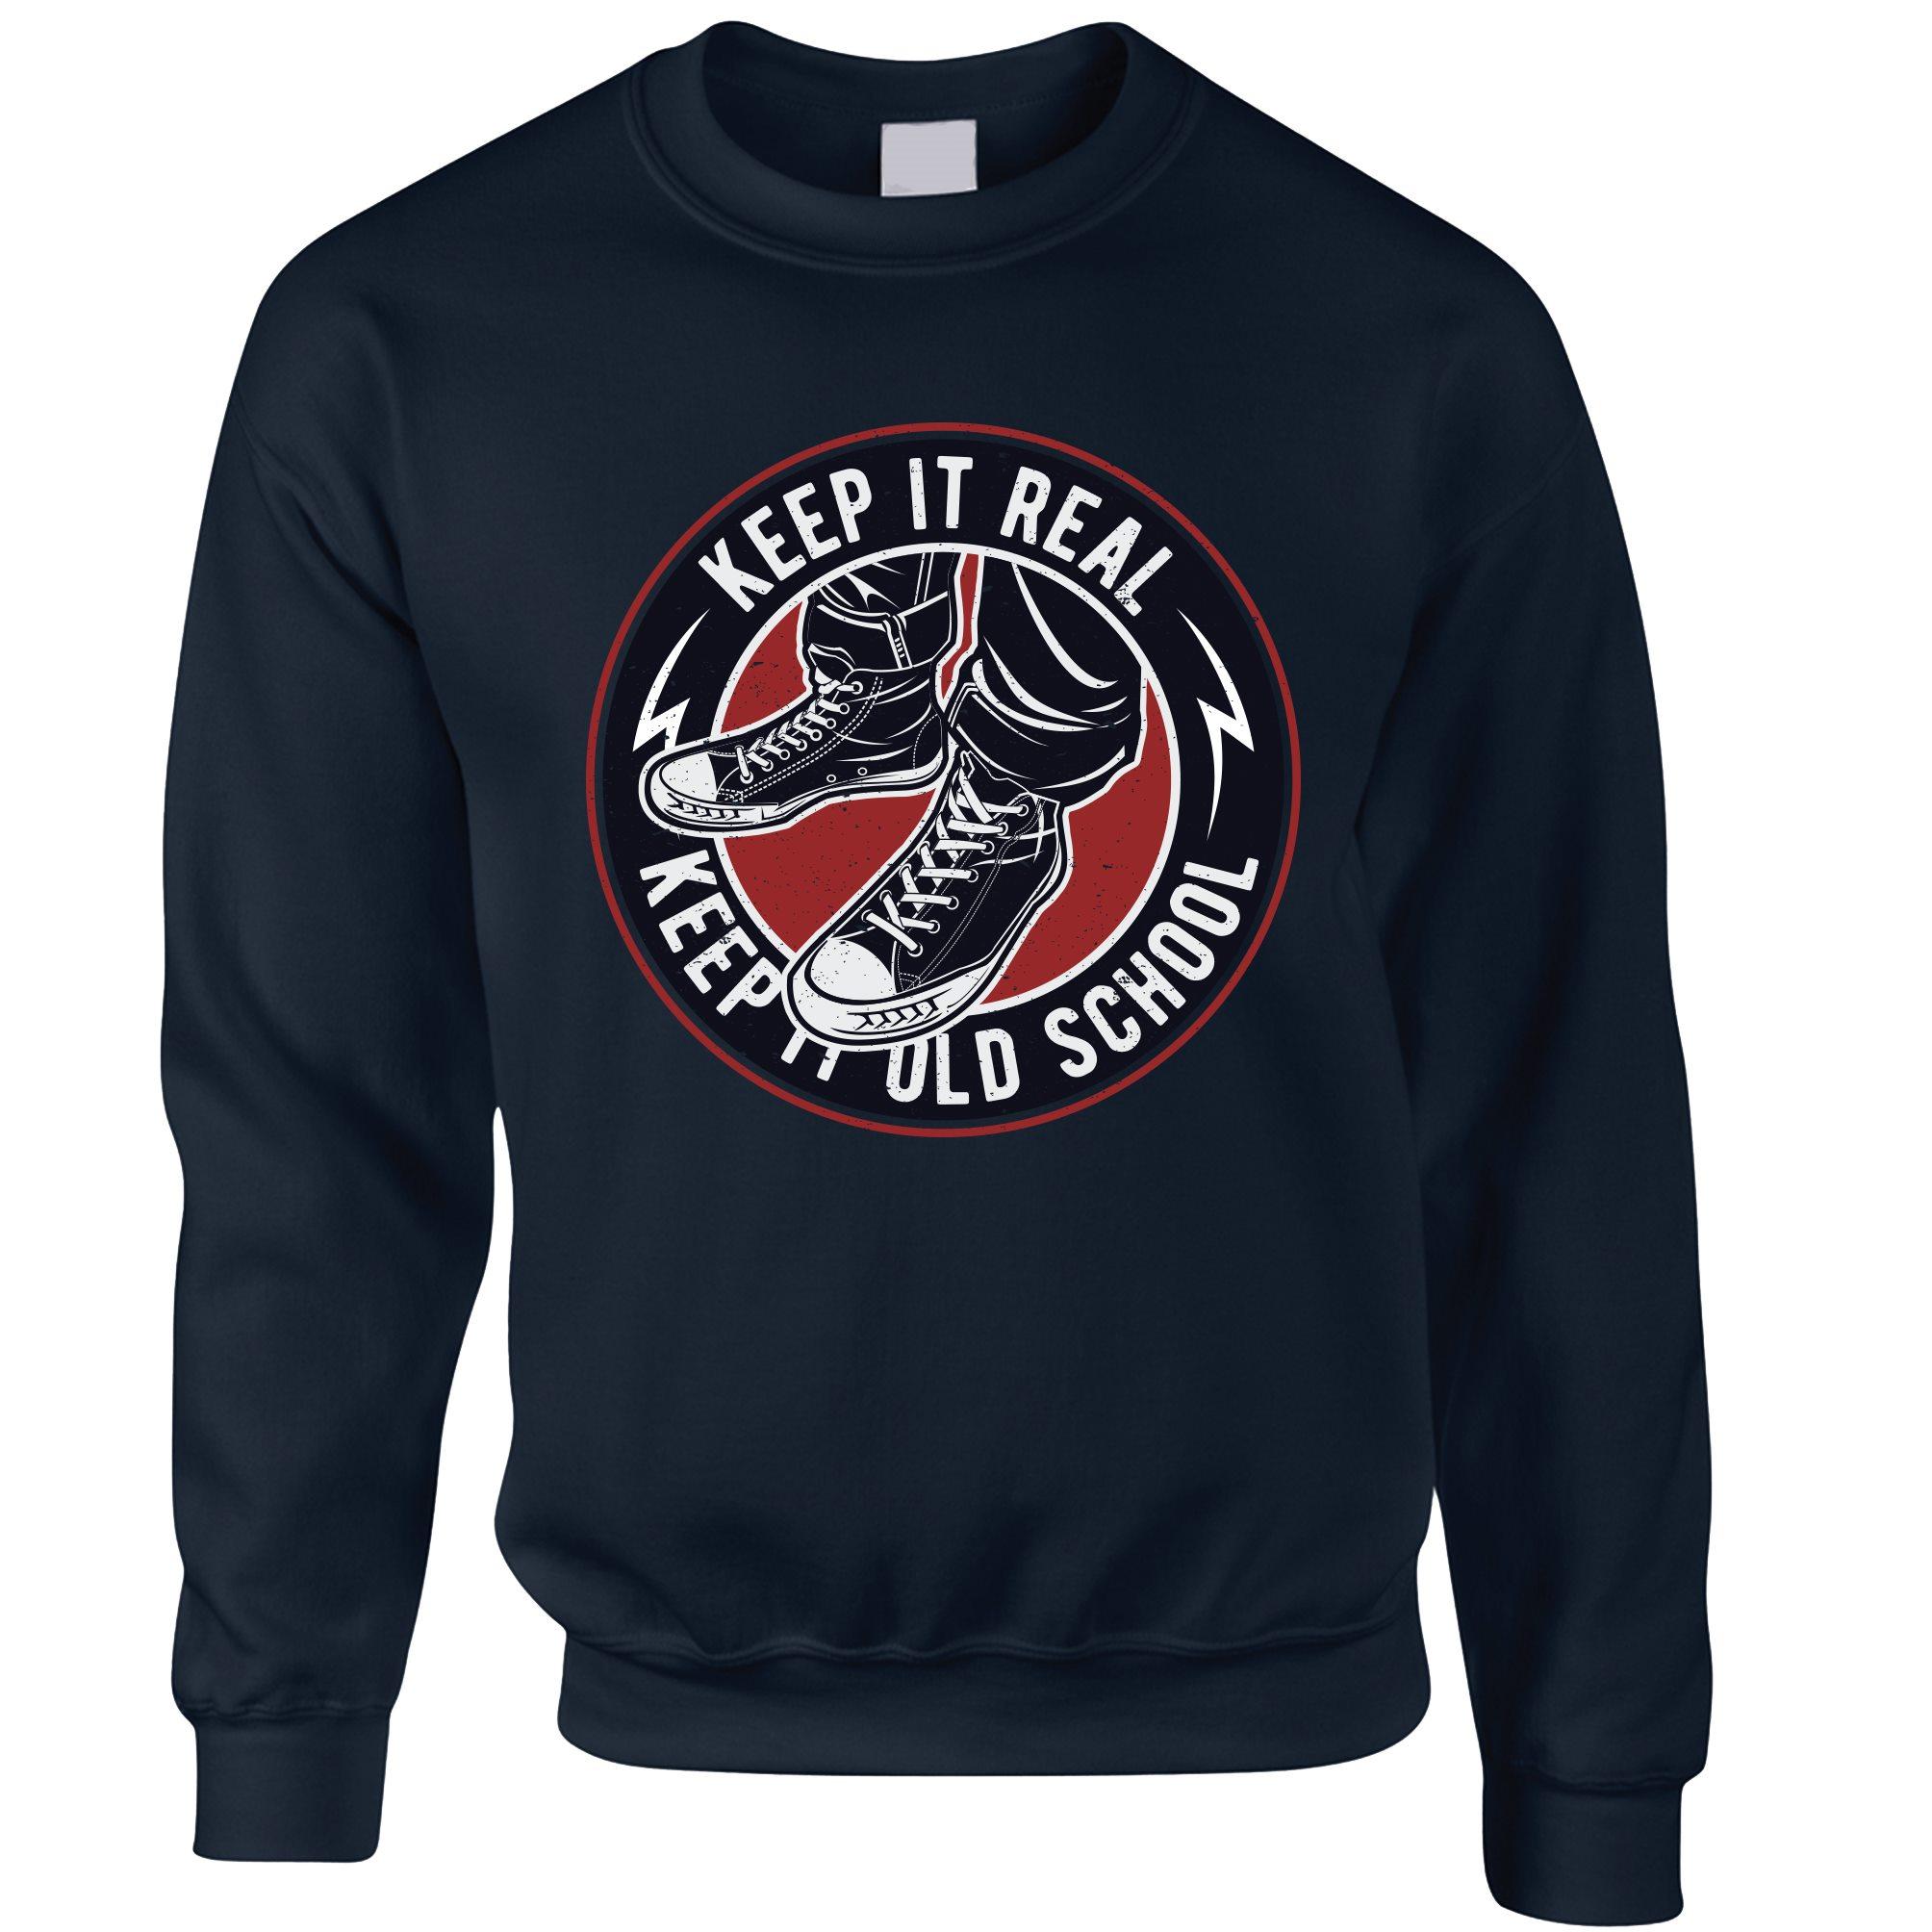 Illmatic Herren Sweatshirt Pullover Sweater Smalls Crewneck